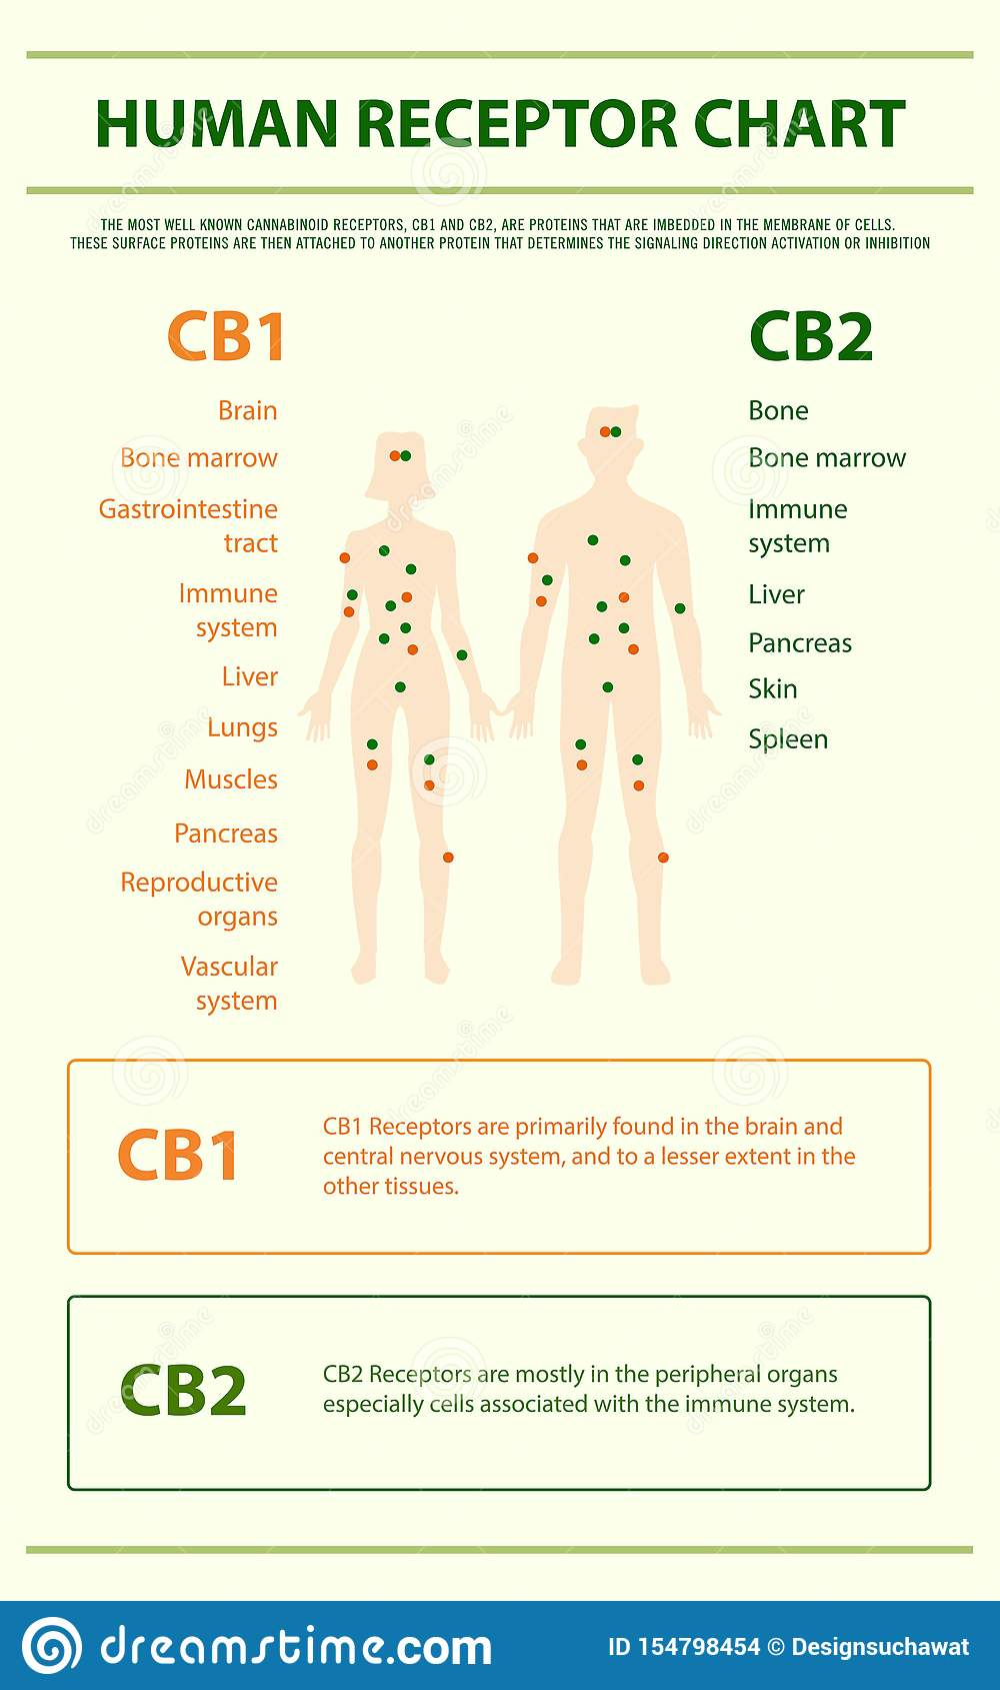 Human receptor chart vertical infographic